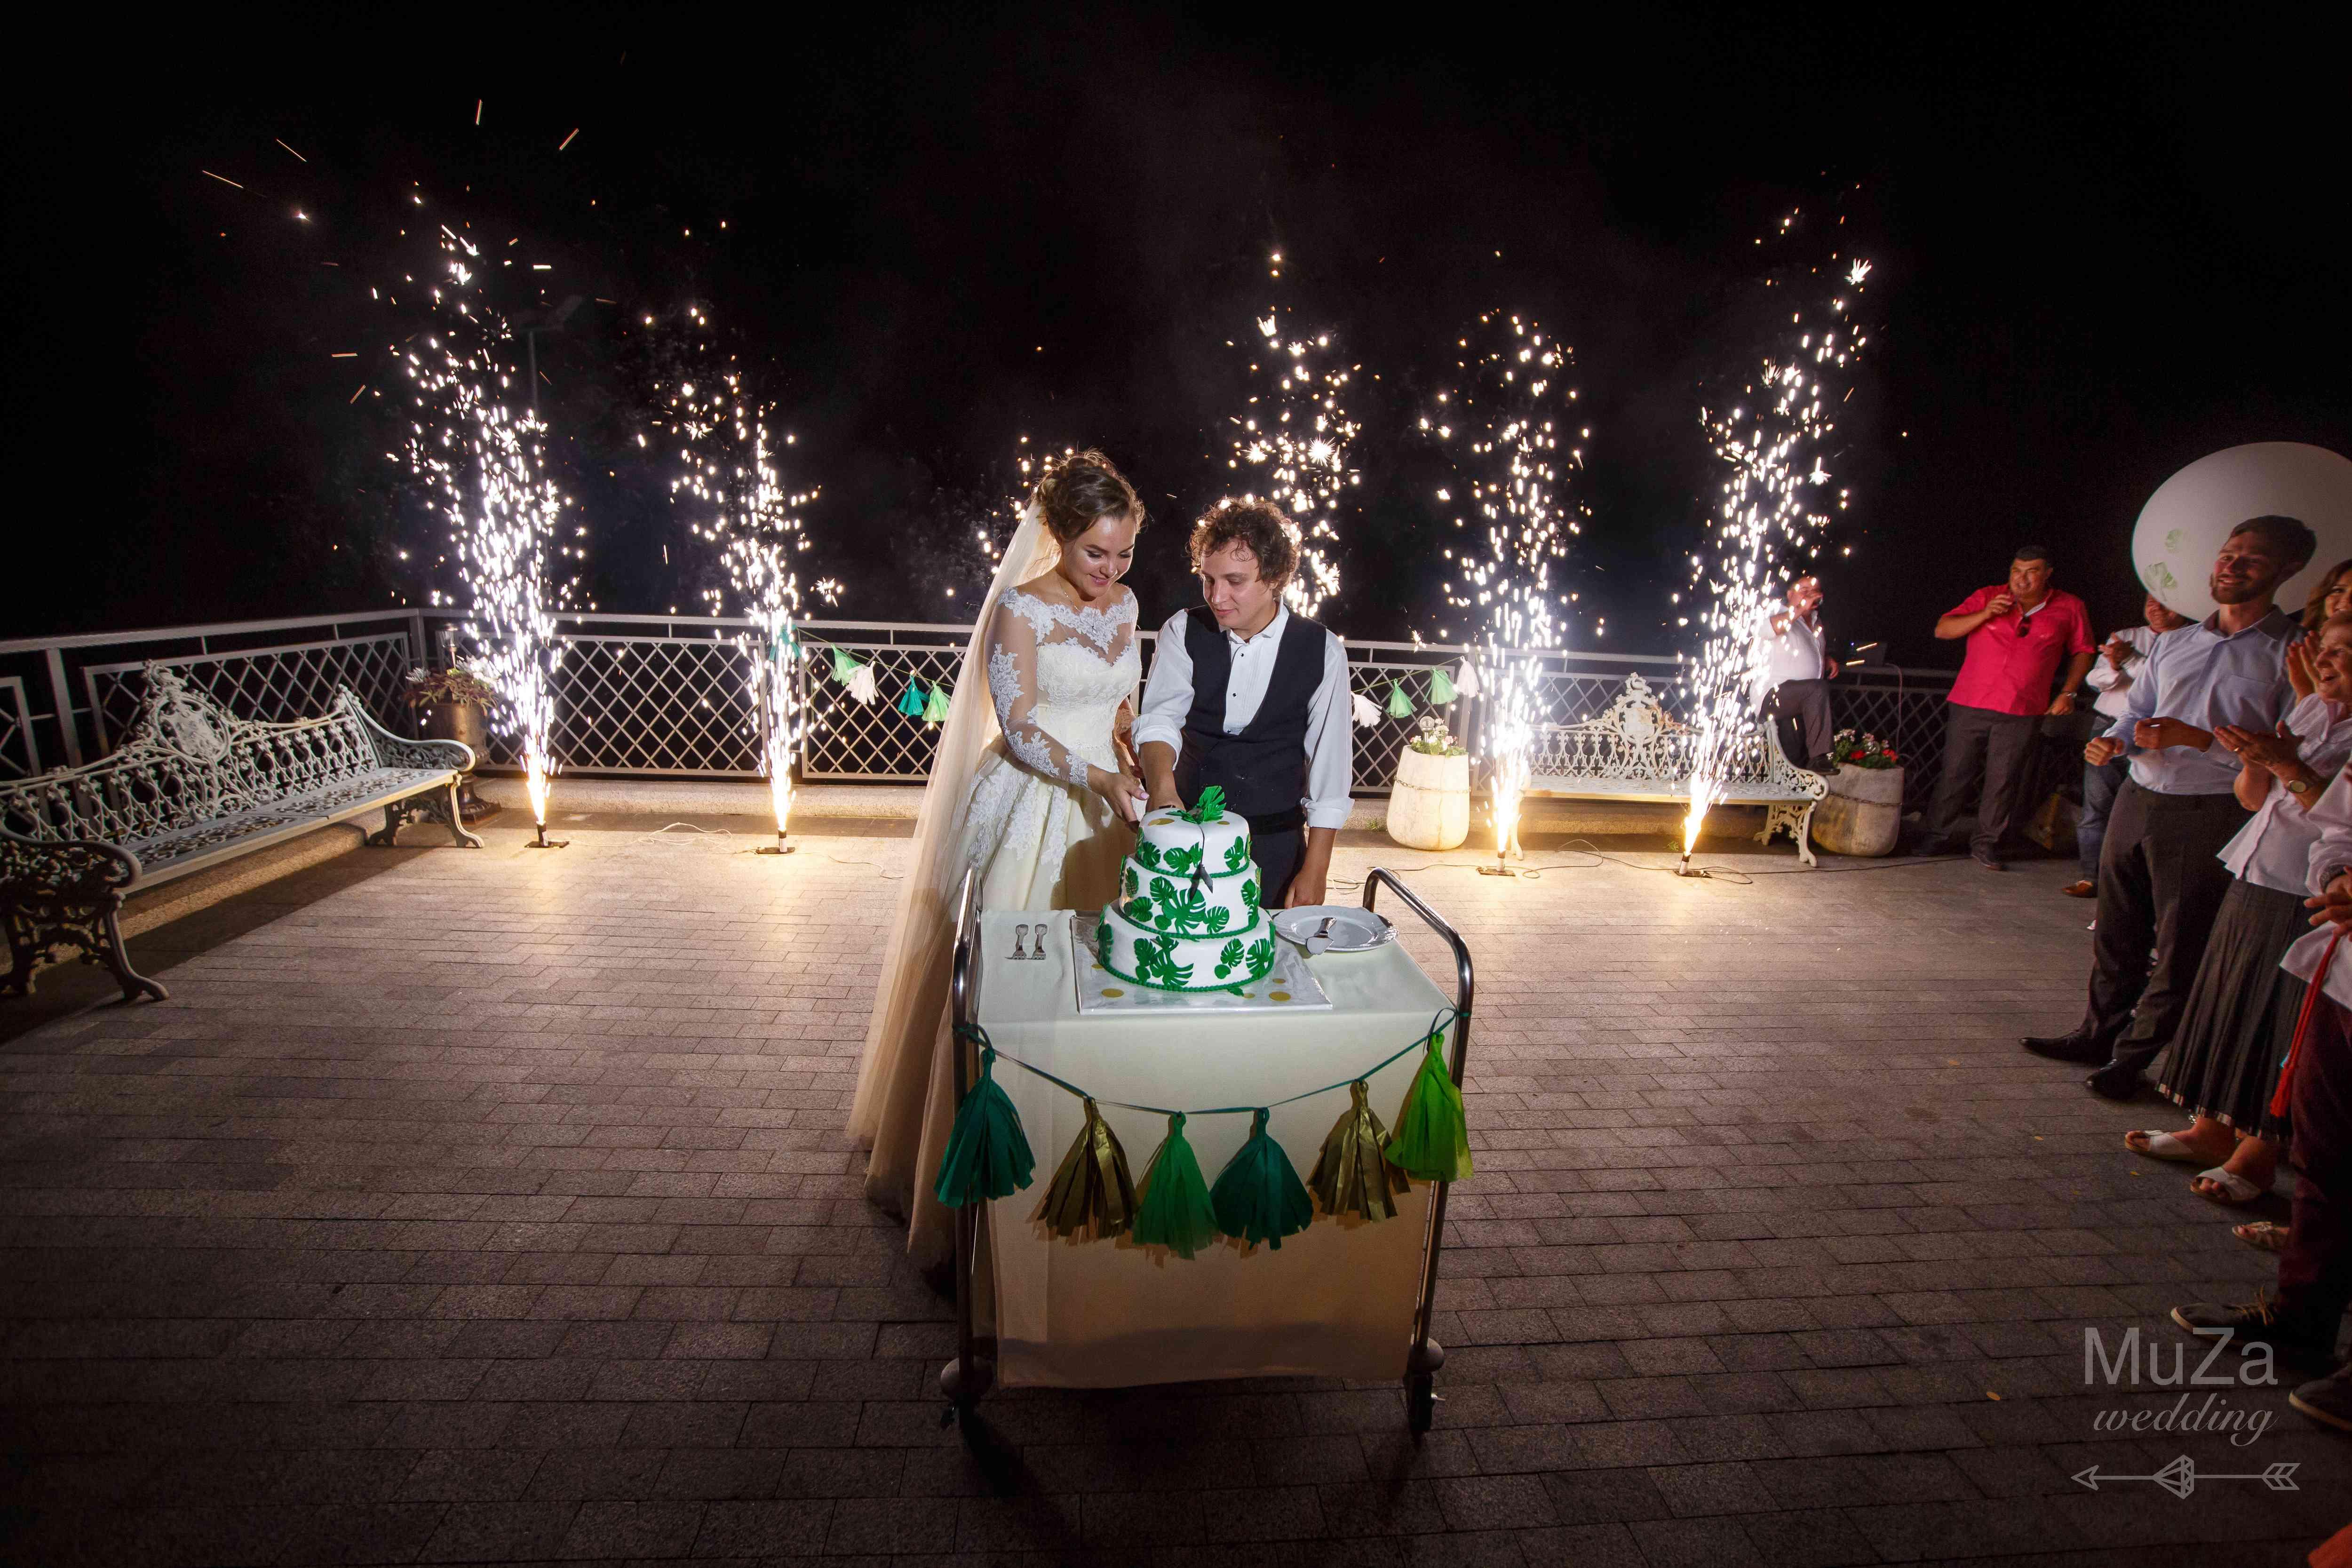 обряд разрезания торта на свадьбе